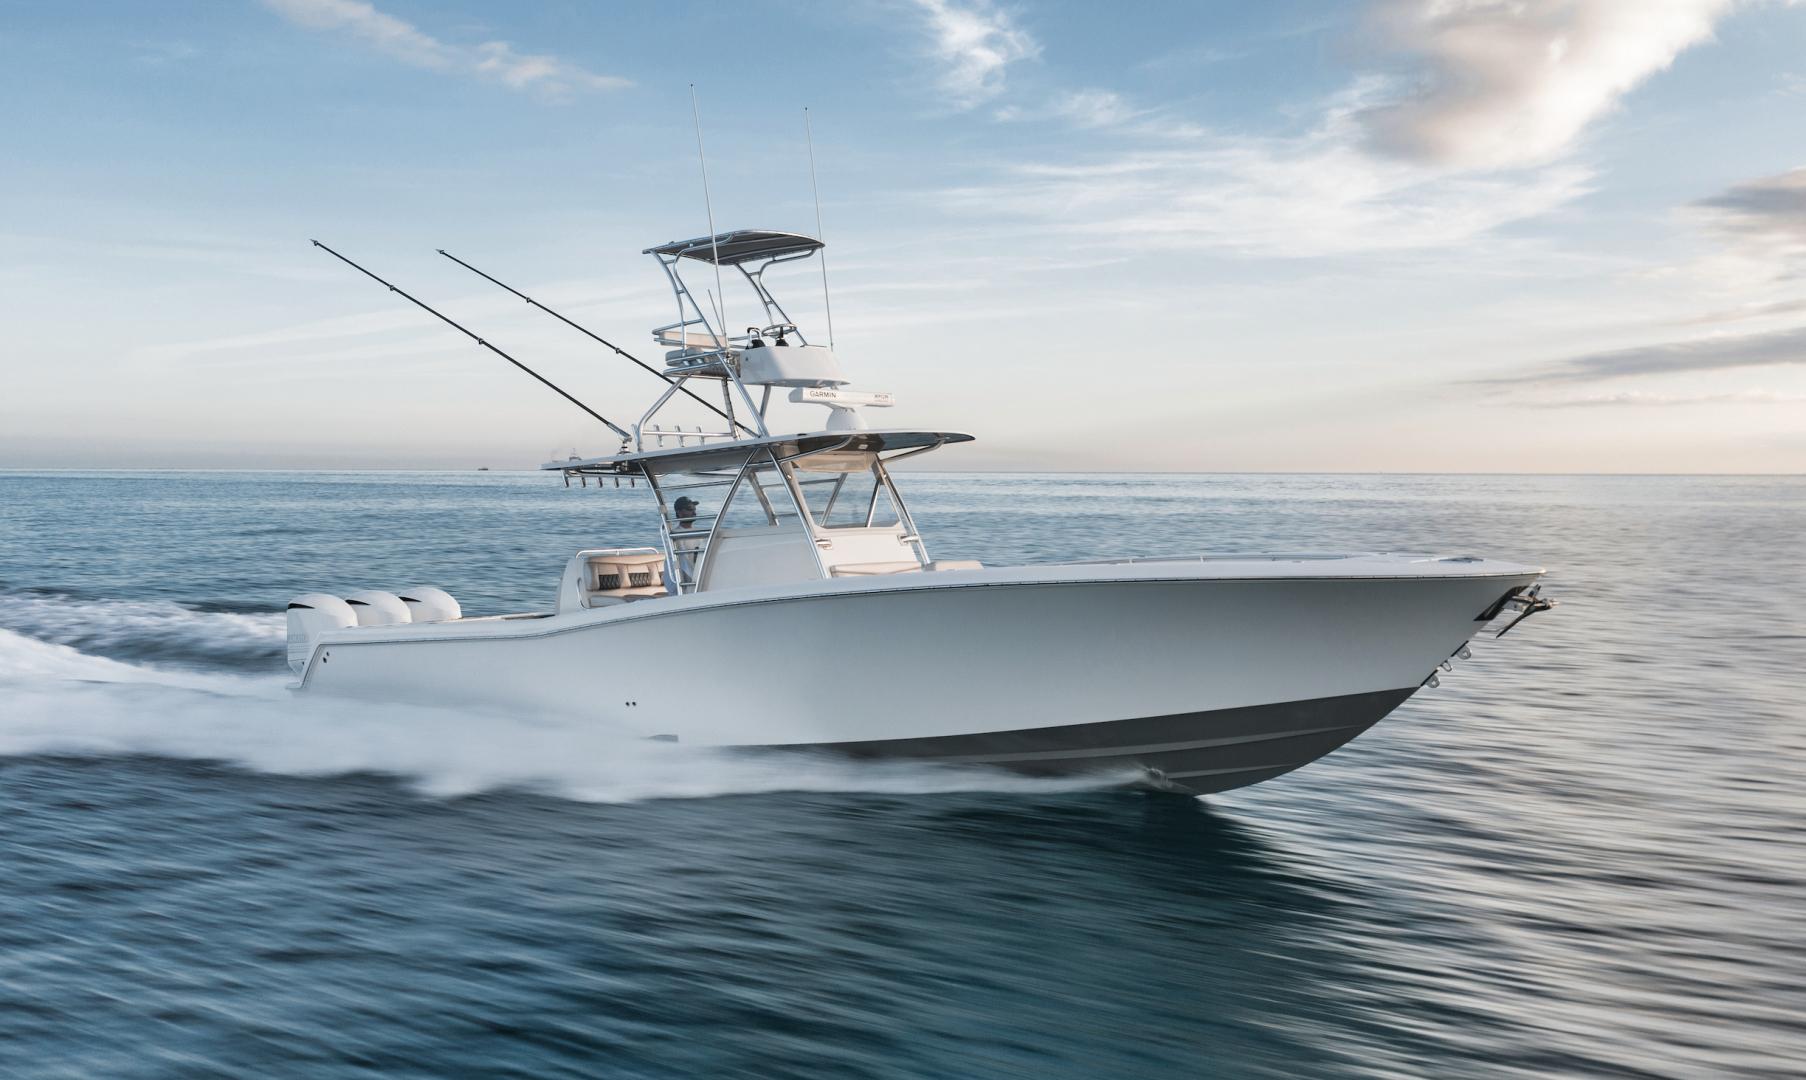 Invincible-Open Fisherman 2017-42 Invincible Jupiter-Florida-United States-1604176   Thumbnail